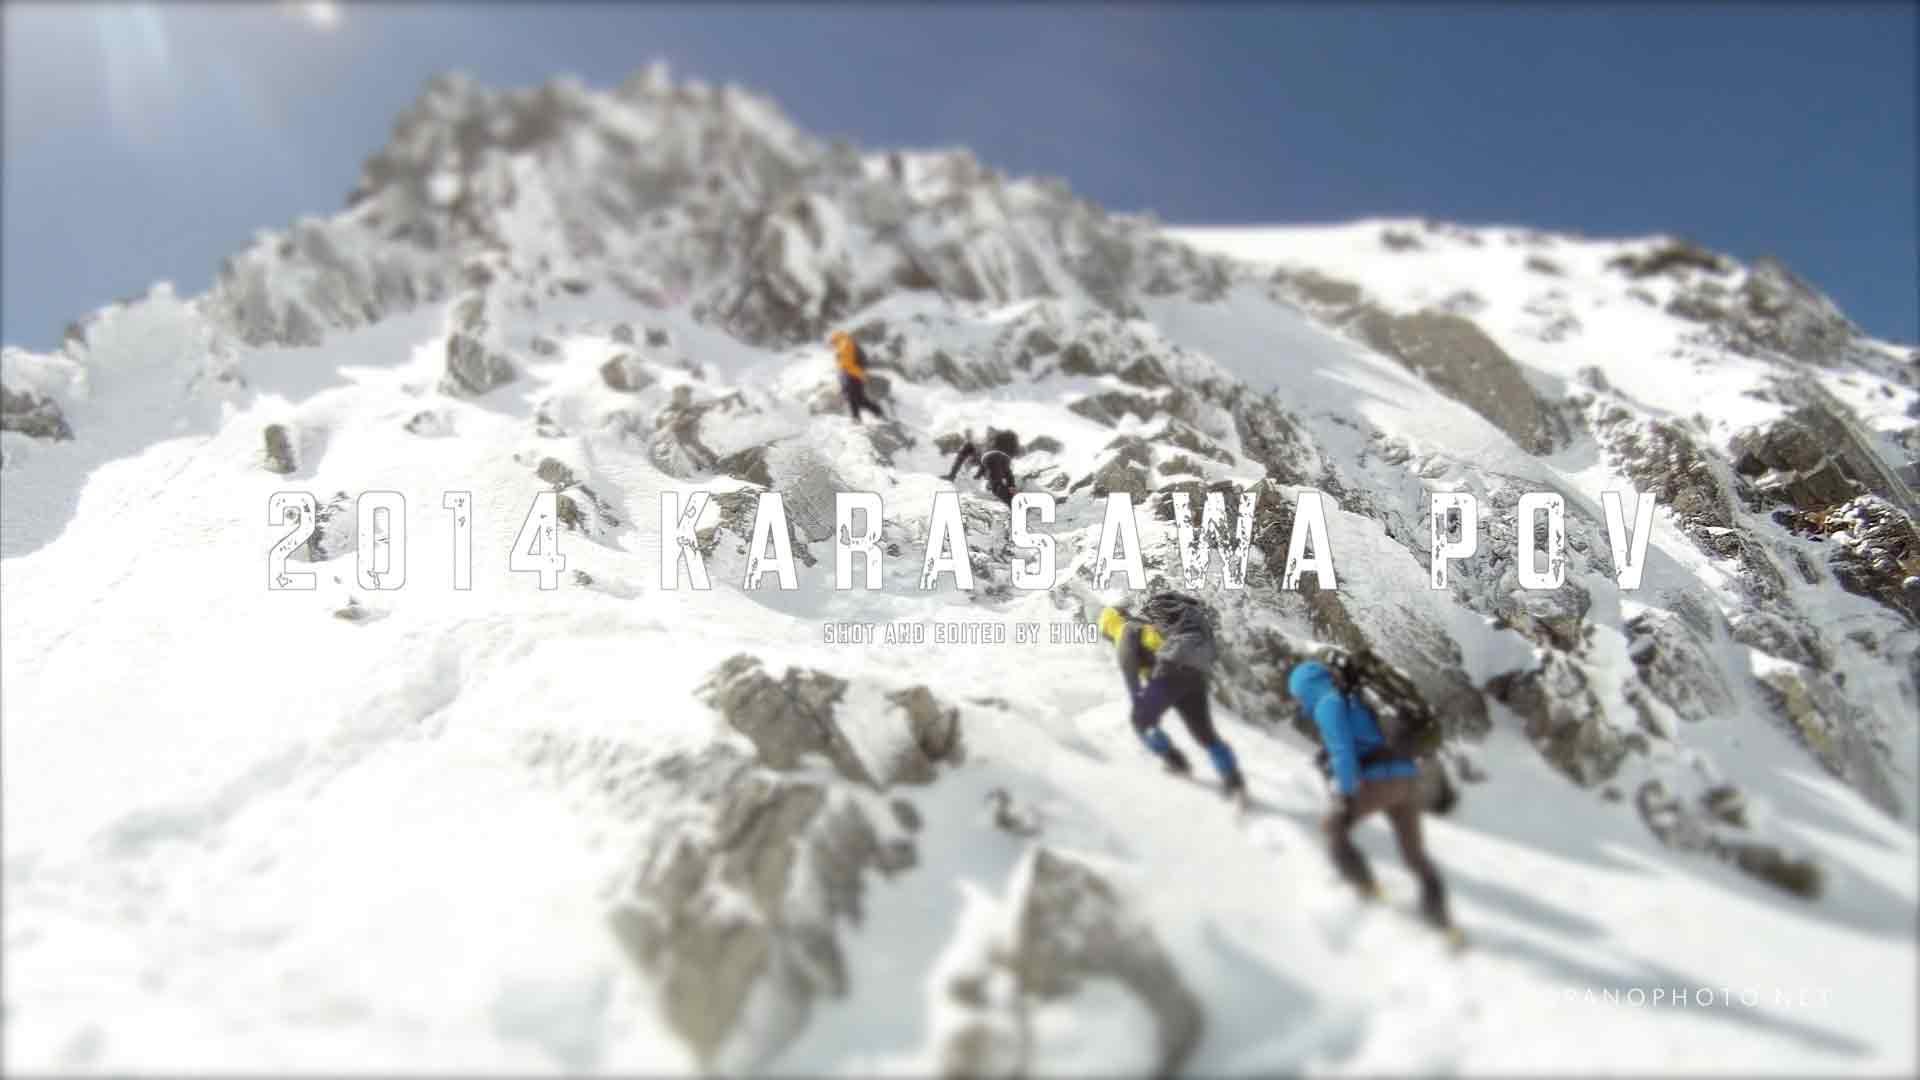 Karasawa-POV-Featured-Image